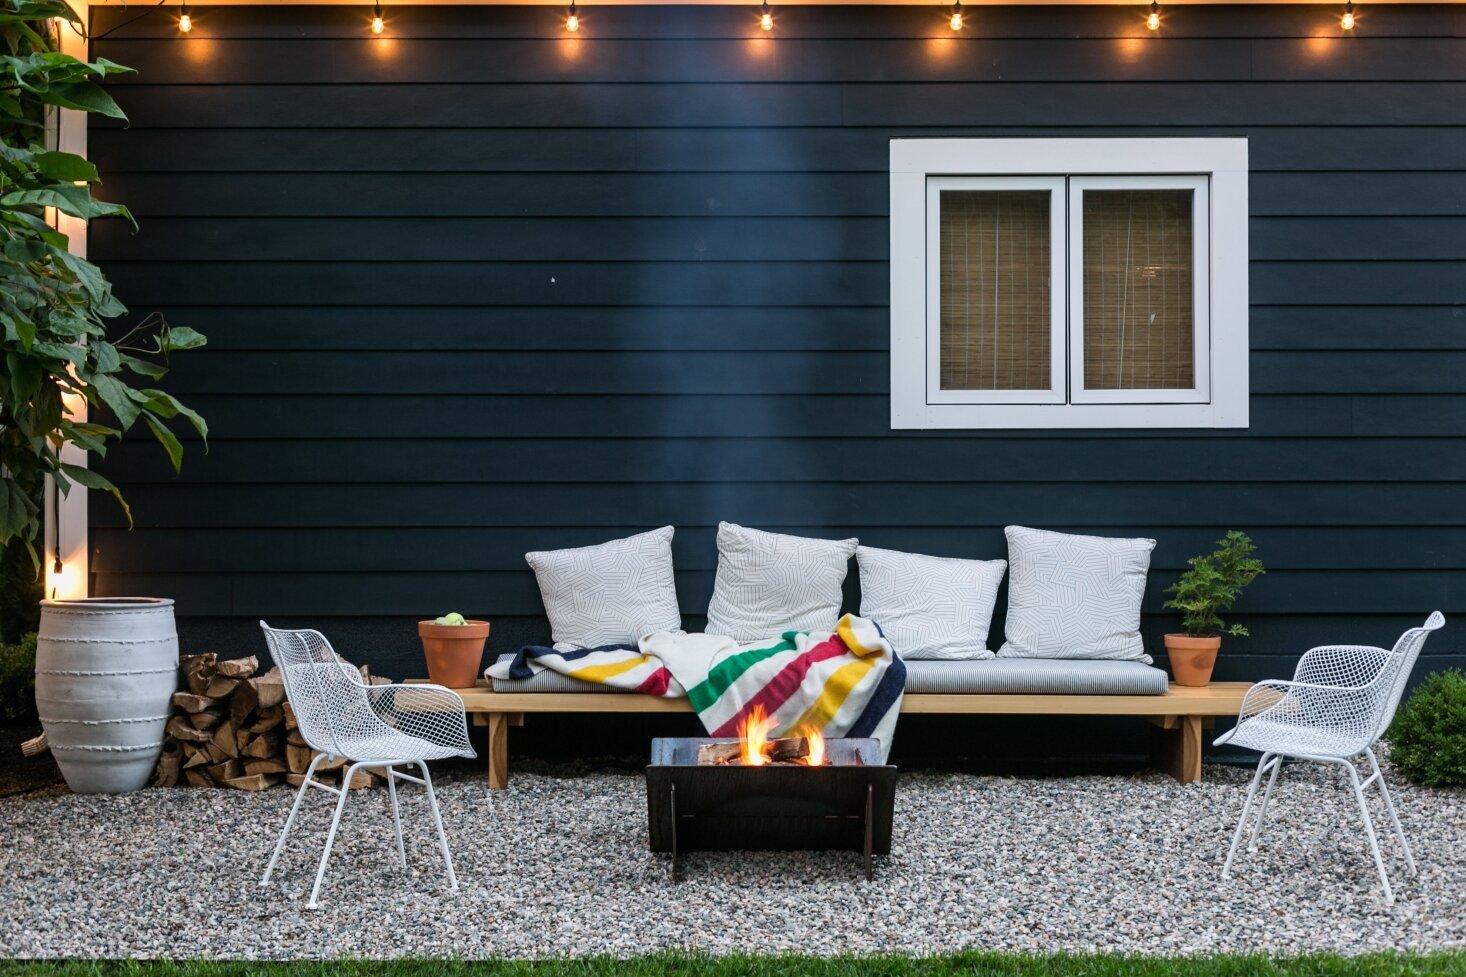 fire-pit-gravel-patio-seating-string-lights-michelle-adams-ann-arbor-by-marta-xochilt-perez-1466x977.jpg